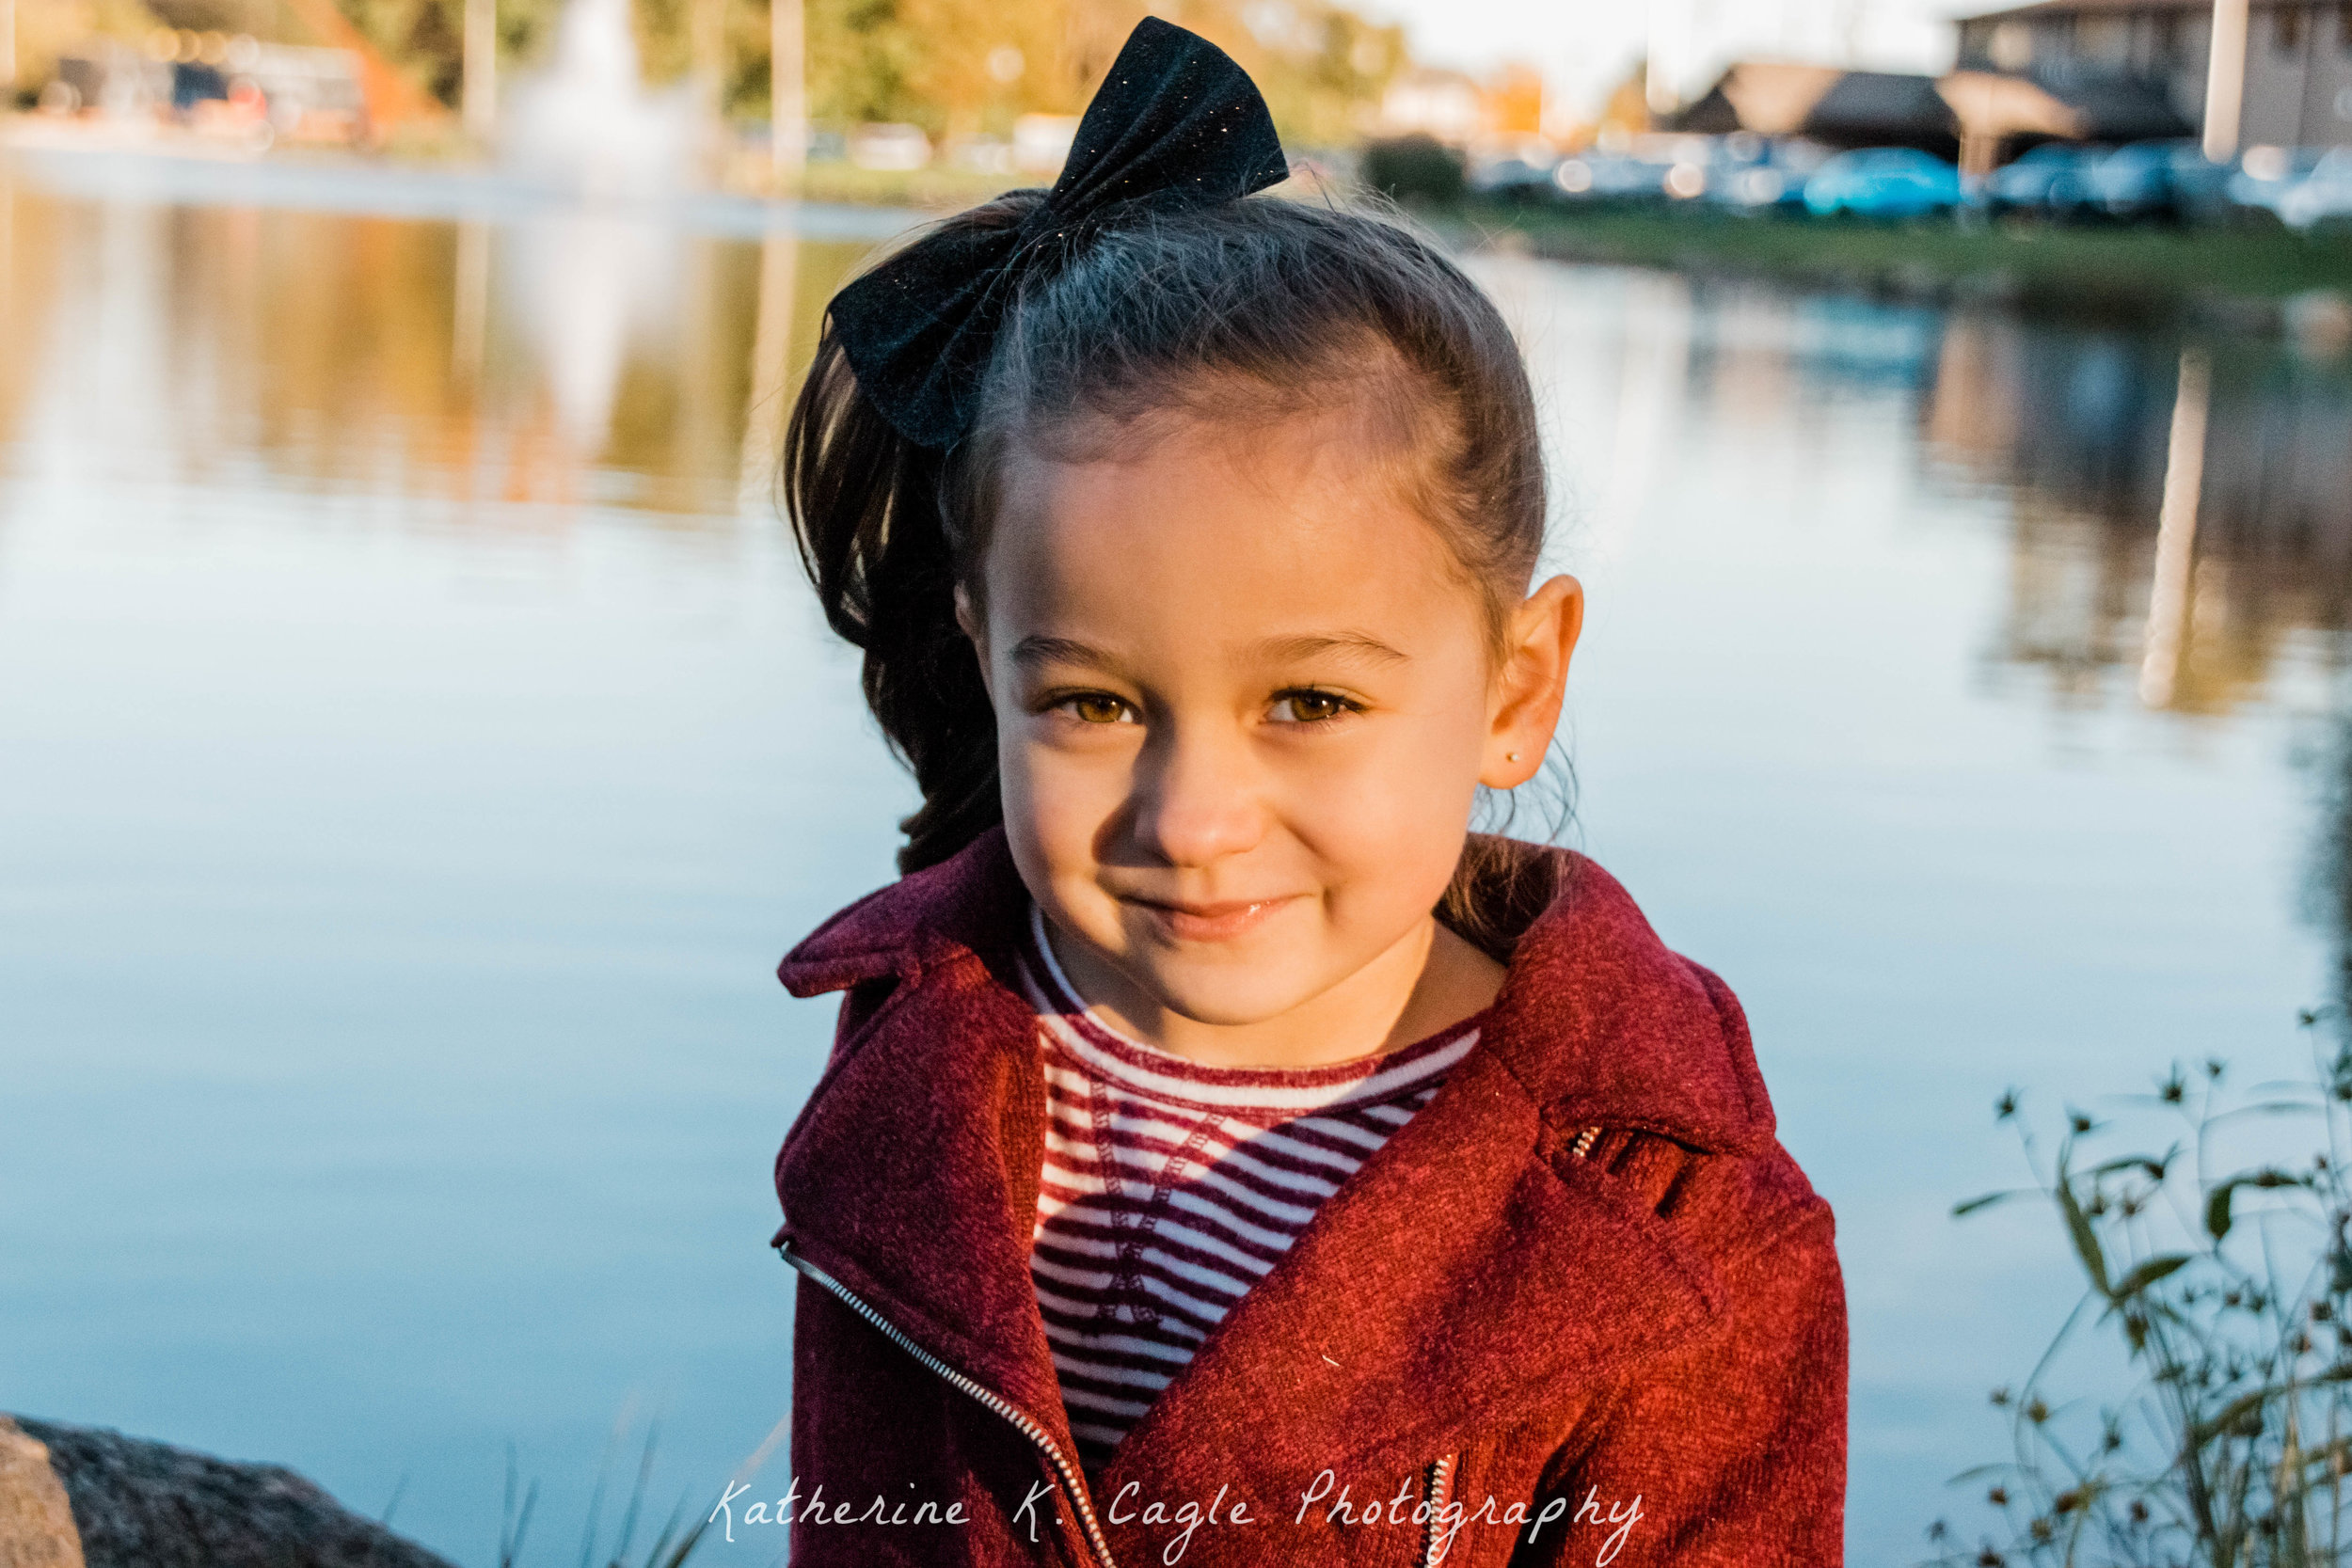 KatherineKCagle_Capogrossa-17.jpg